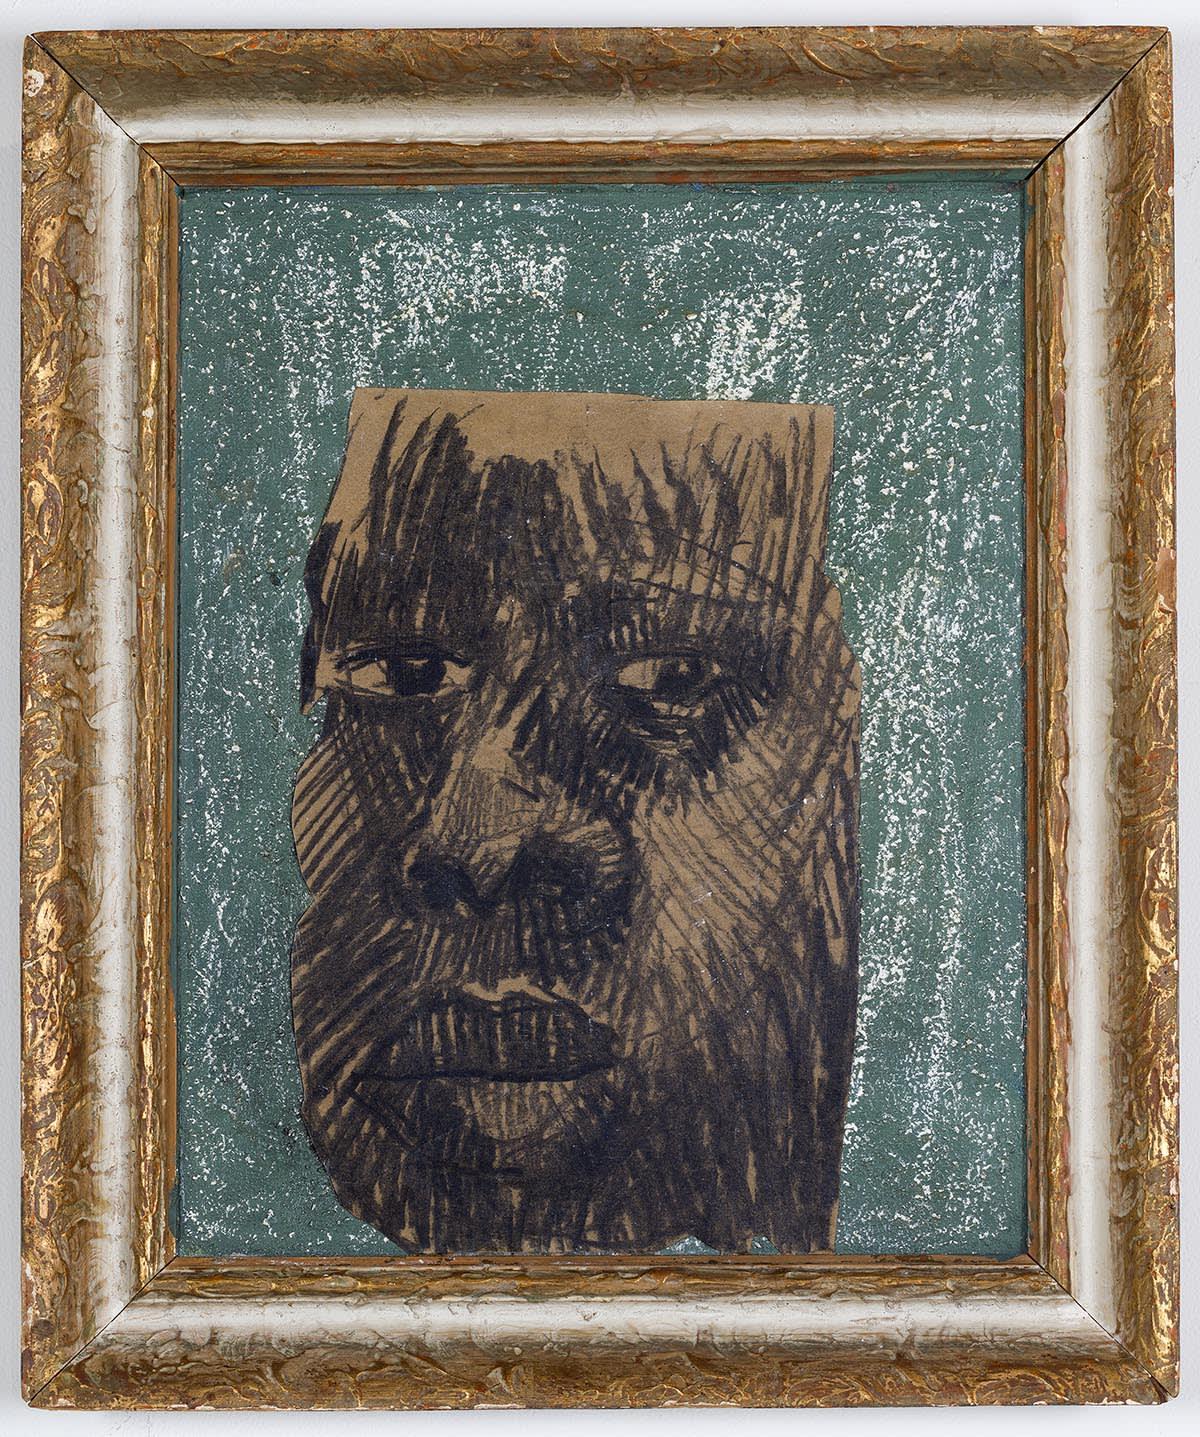 Ronald Muchatuta, Brown face II, 2020